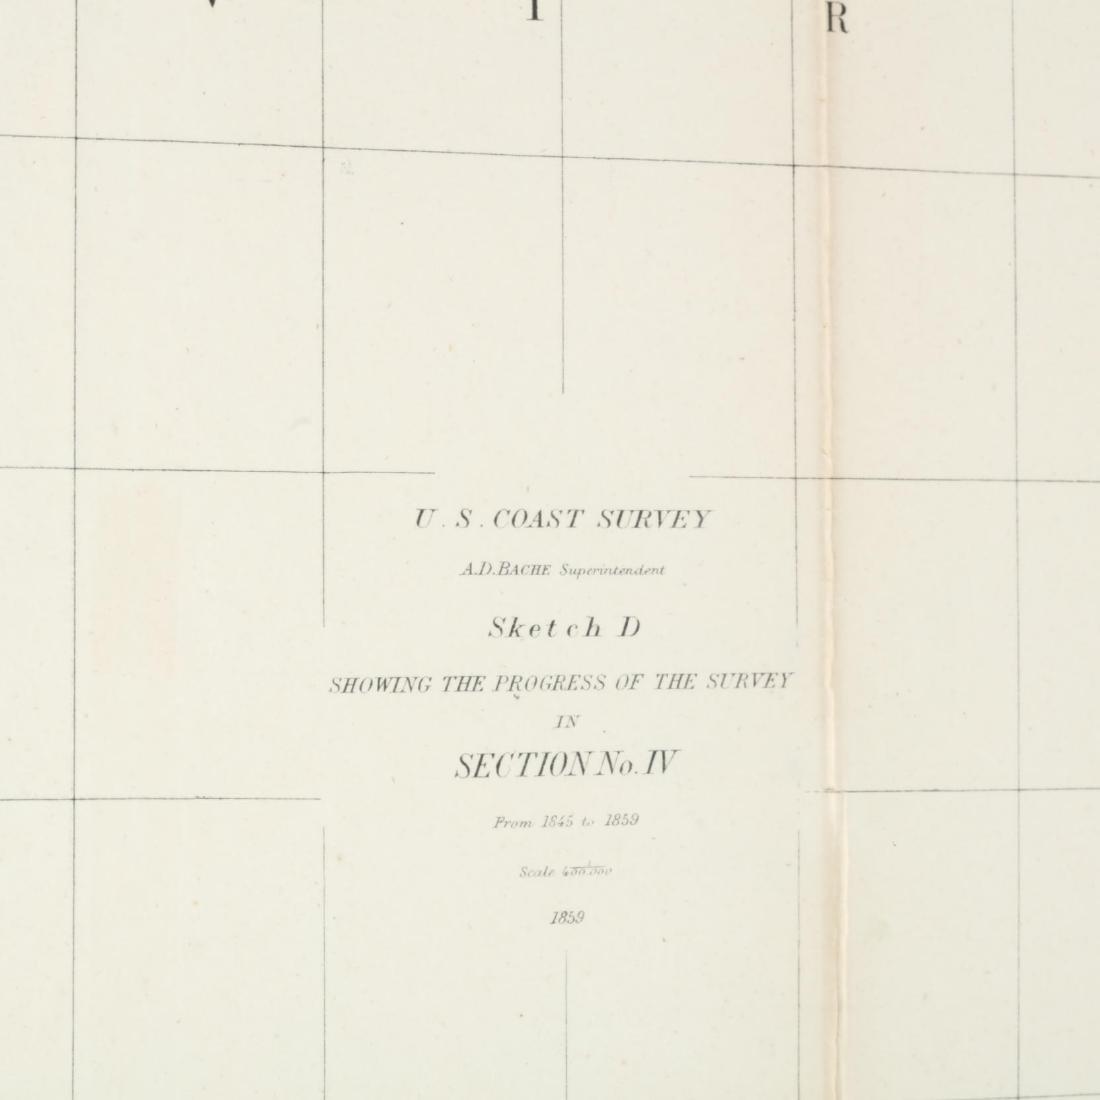 Antebellum U.S. Coast Survey Map of North Carolina - 2